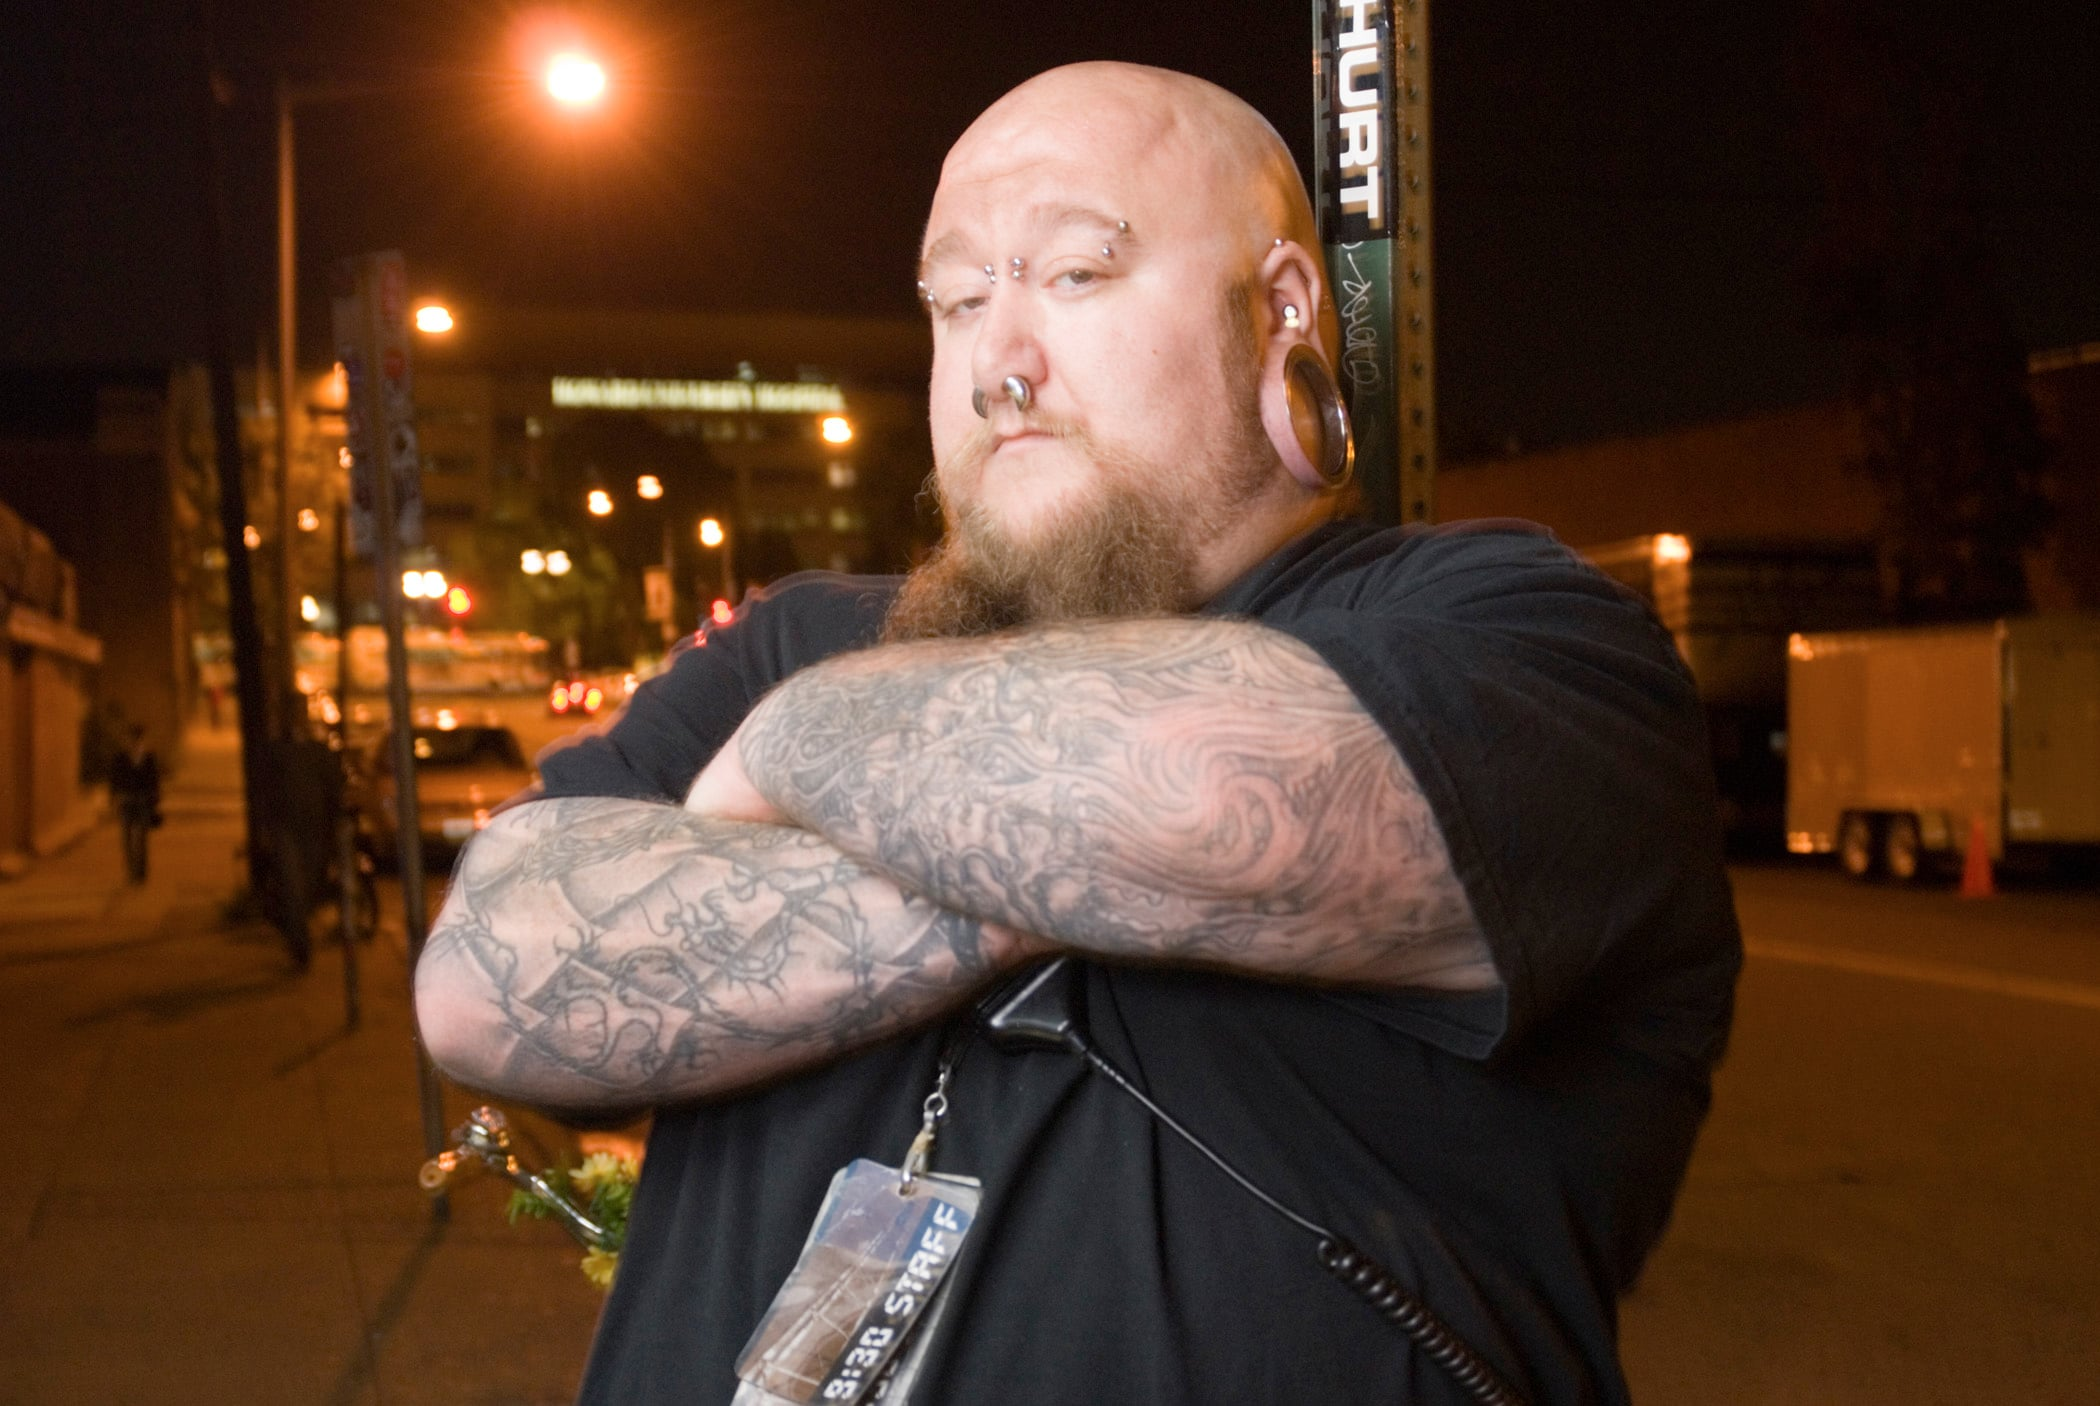 The face of the 9:30 Club, Josh Burdette, has died. (Sora Devore/For The Washington Post)